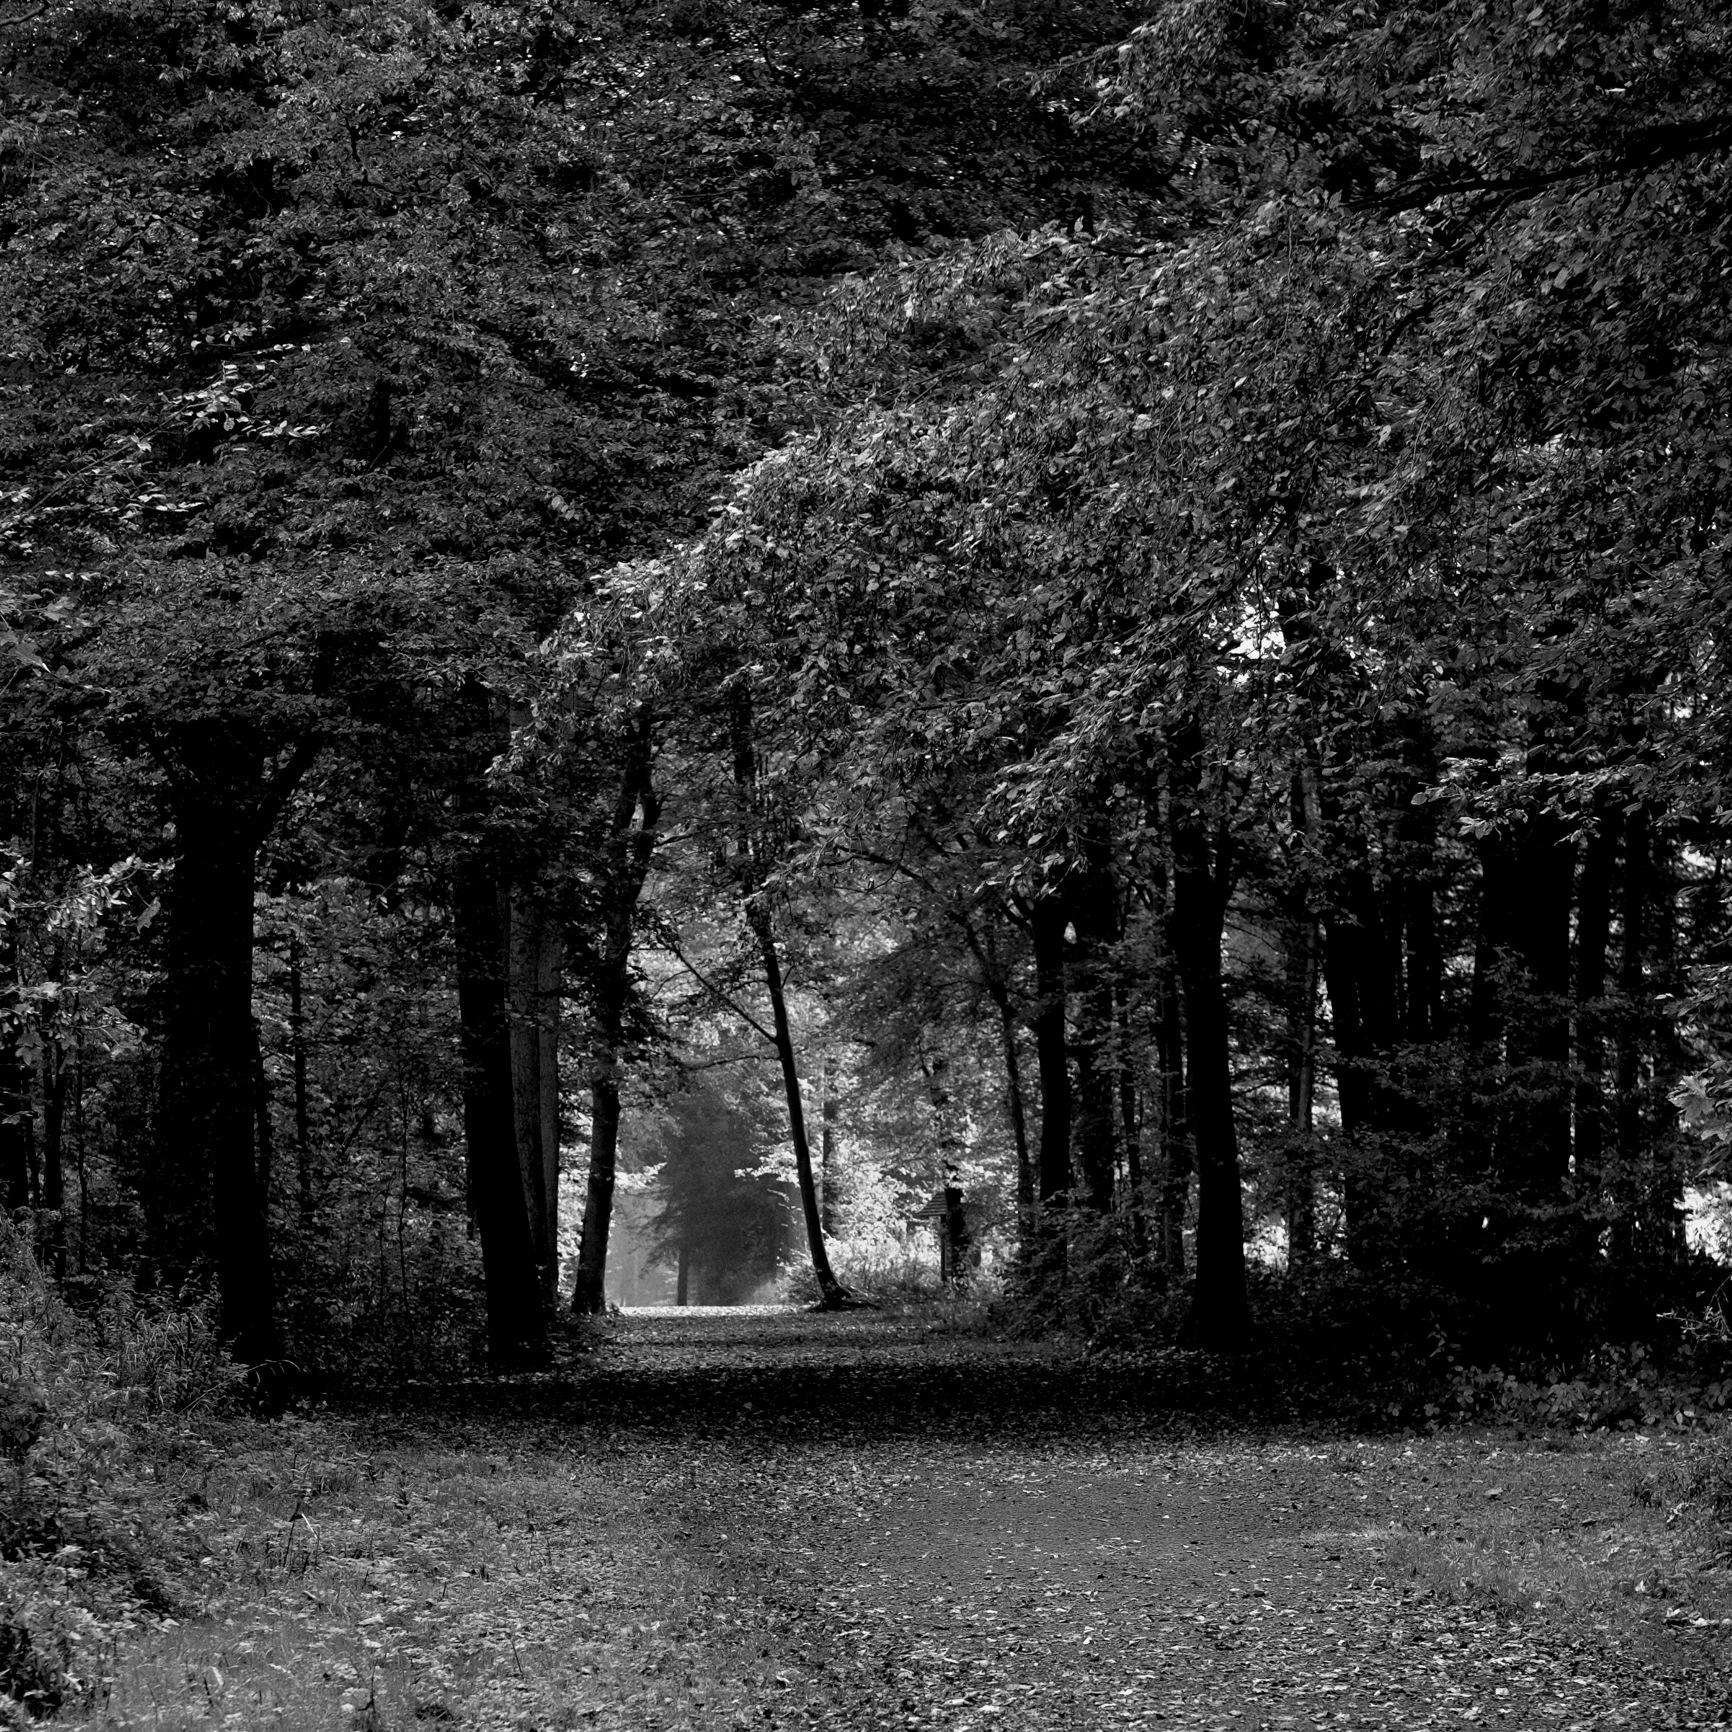 Promenade en forêt... by photosdan